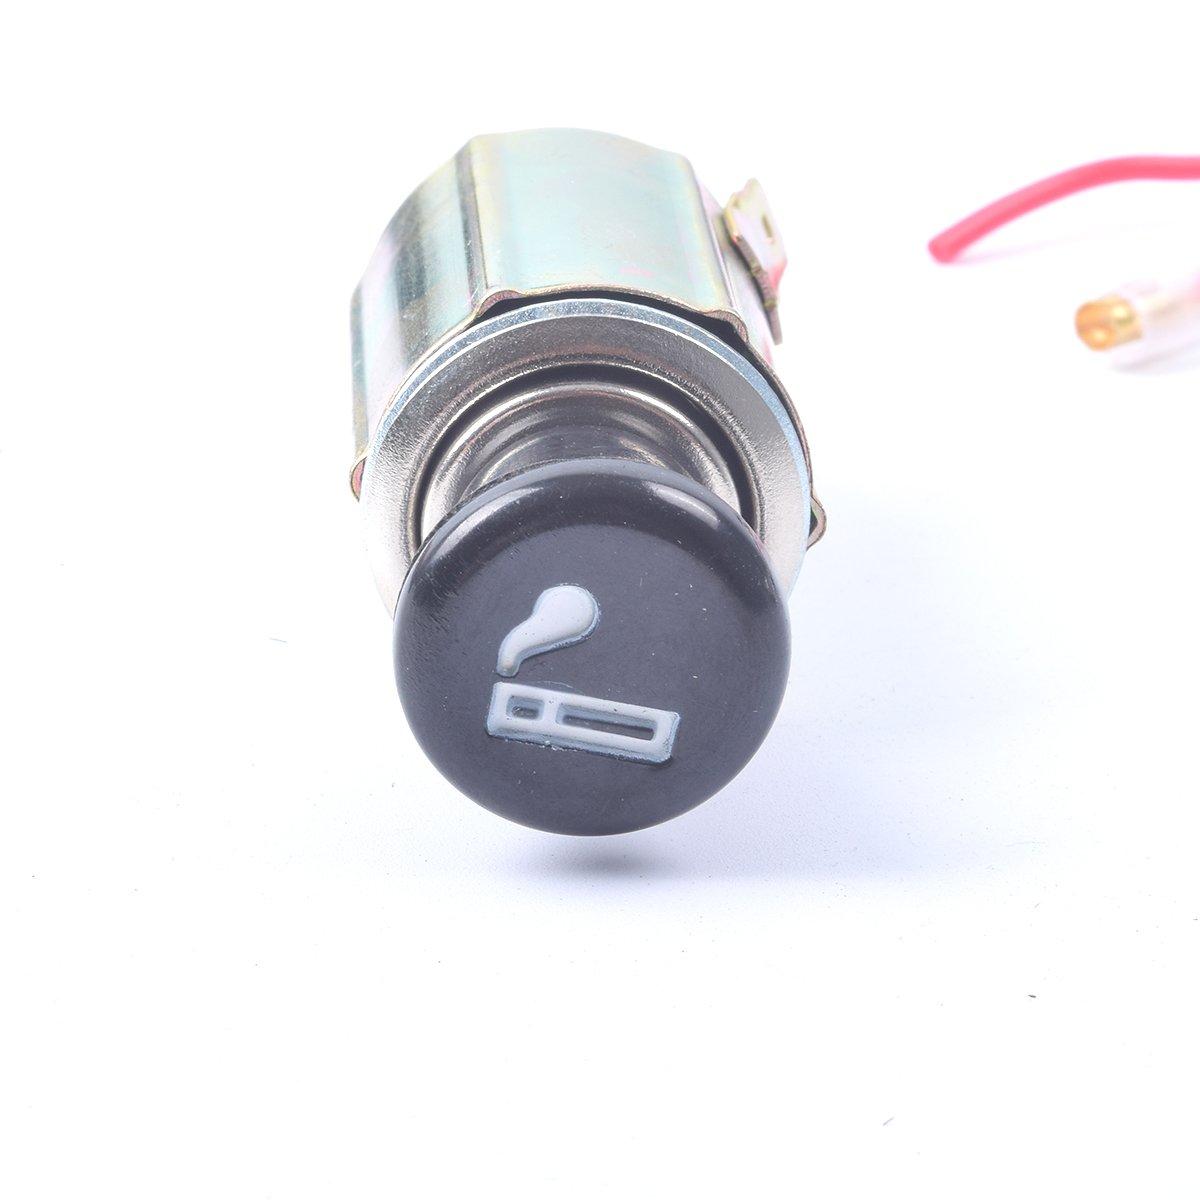 Ekylin Dc 12v Car Auto Cigarette Lighter Replacement F250 Super Duty 1999 Fuse Box Vacuum Pump Plug Socket Assembly Set Automotive